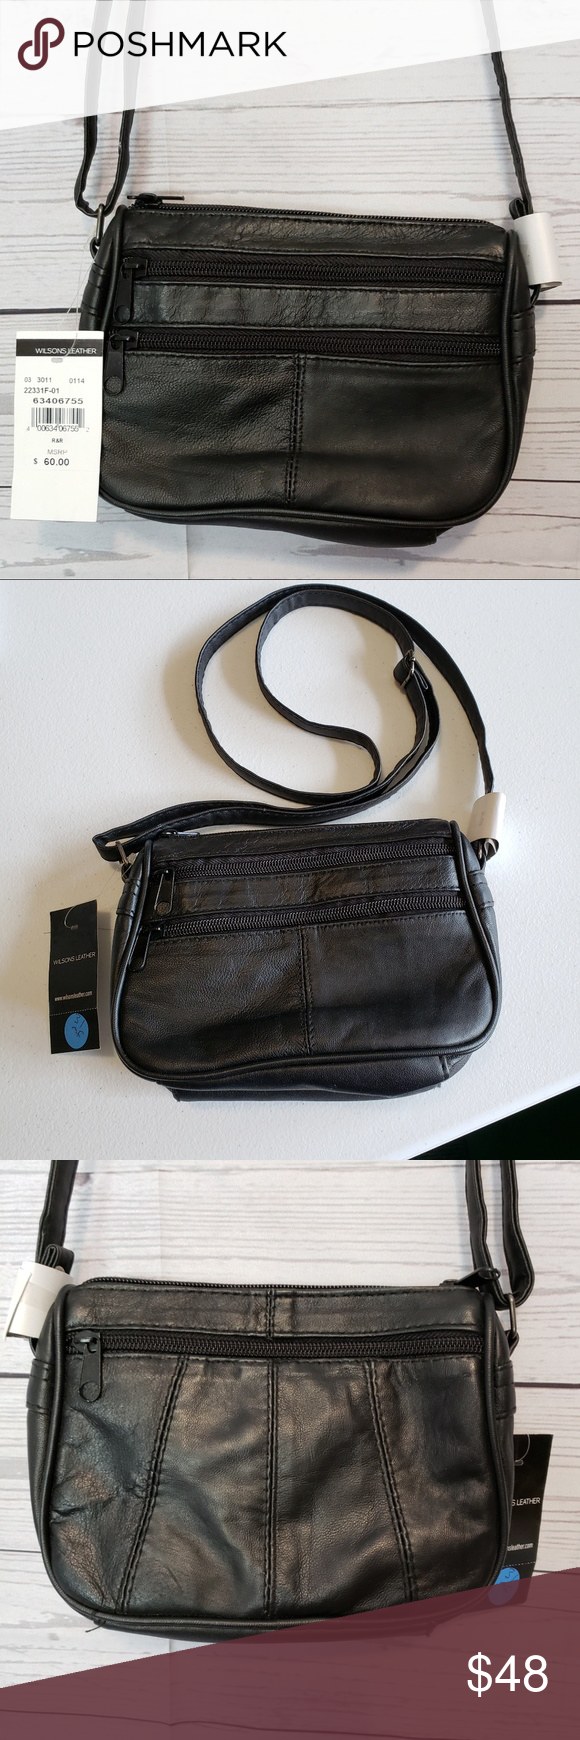 Wilsons Leather Black Crossbody Bag 3 in 1 Set NWT Cute